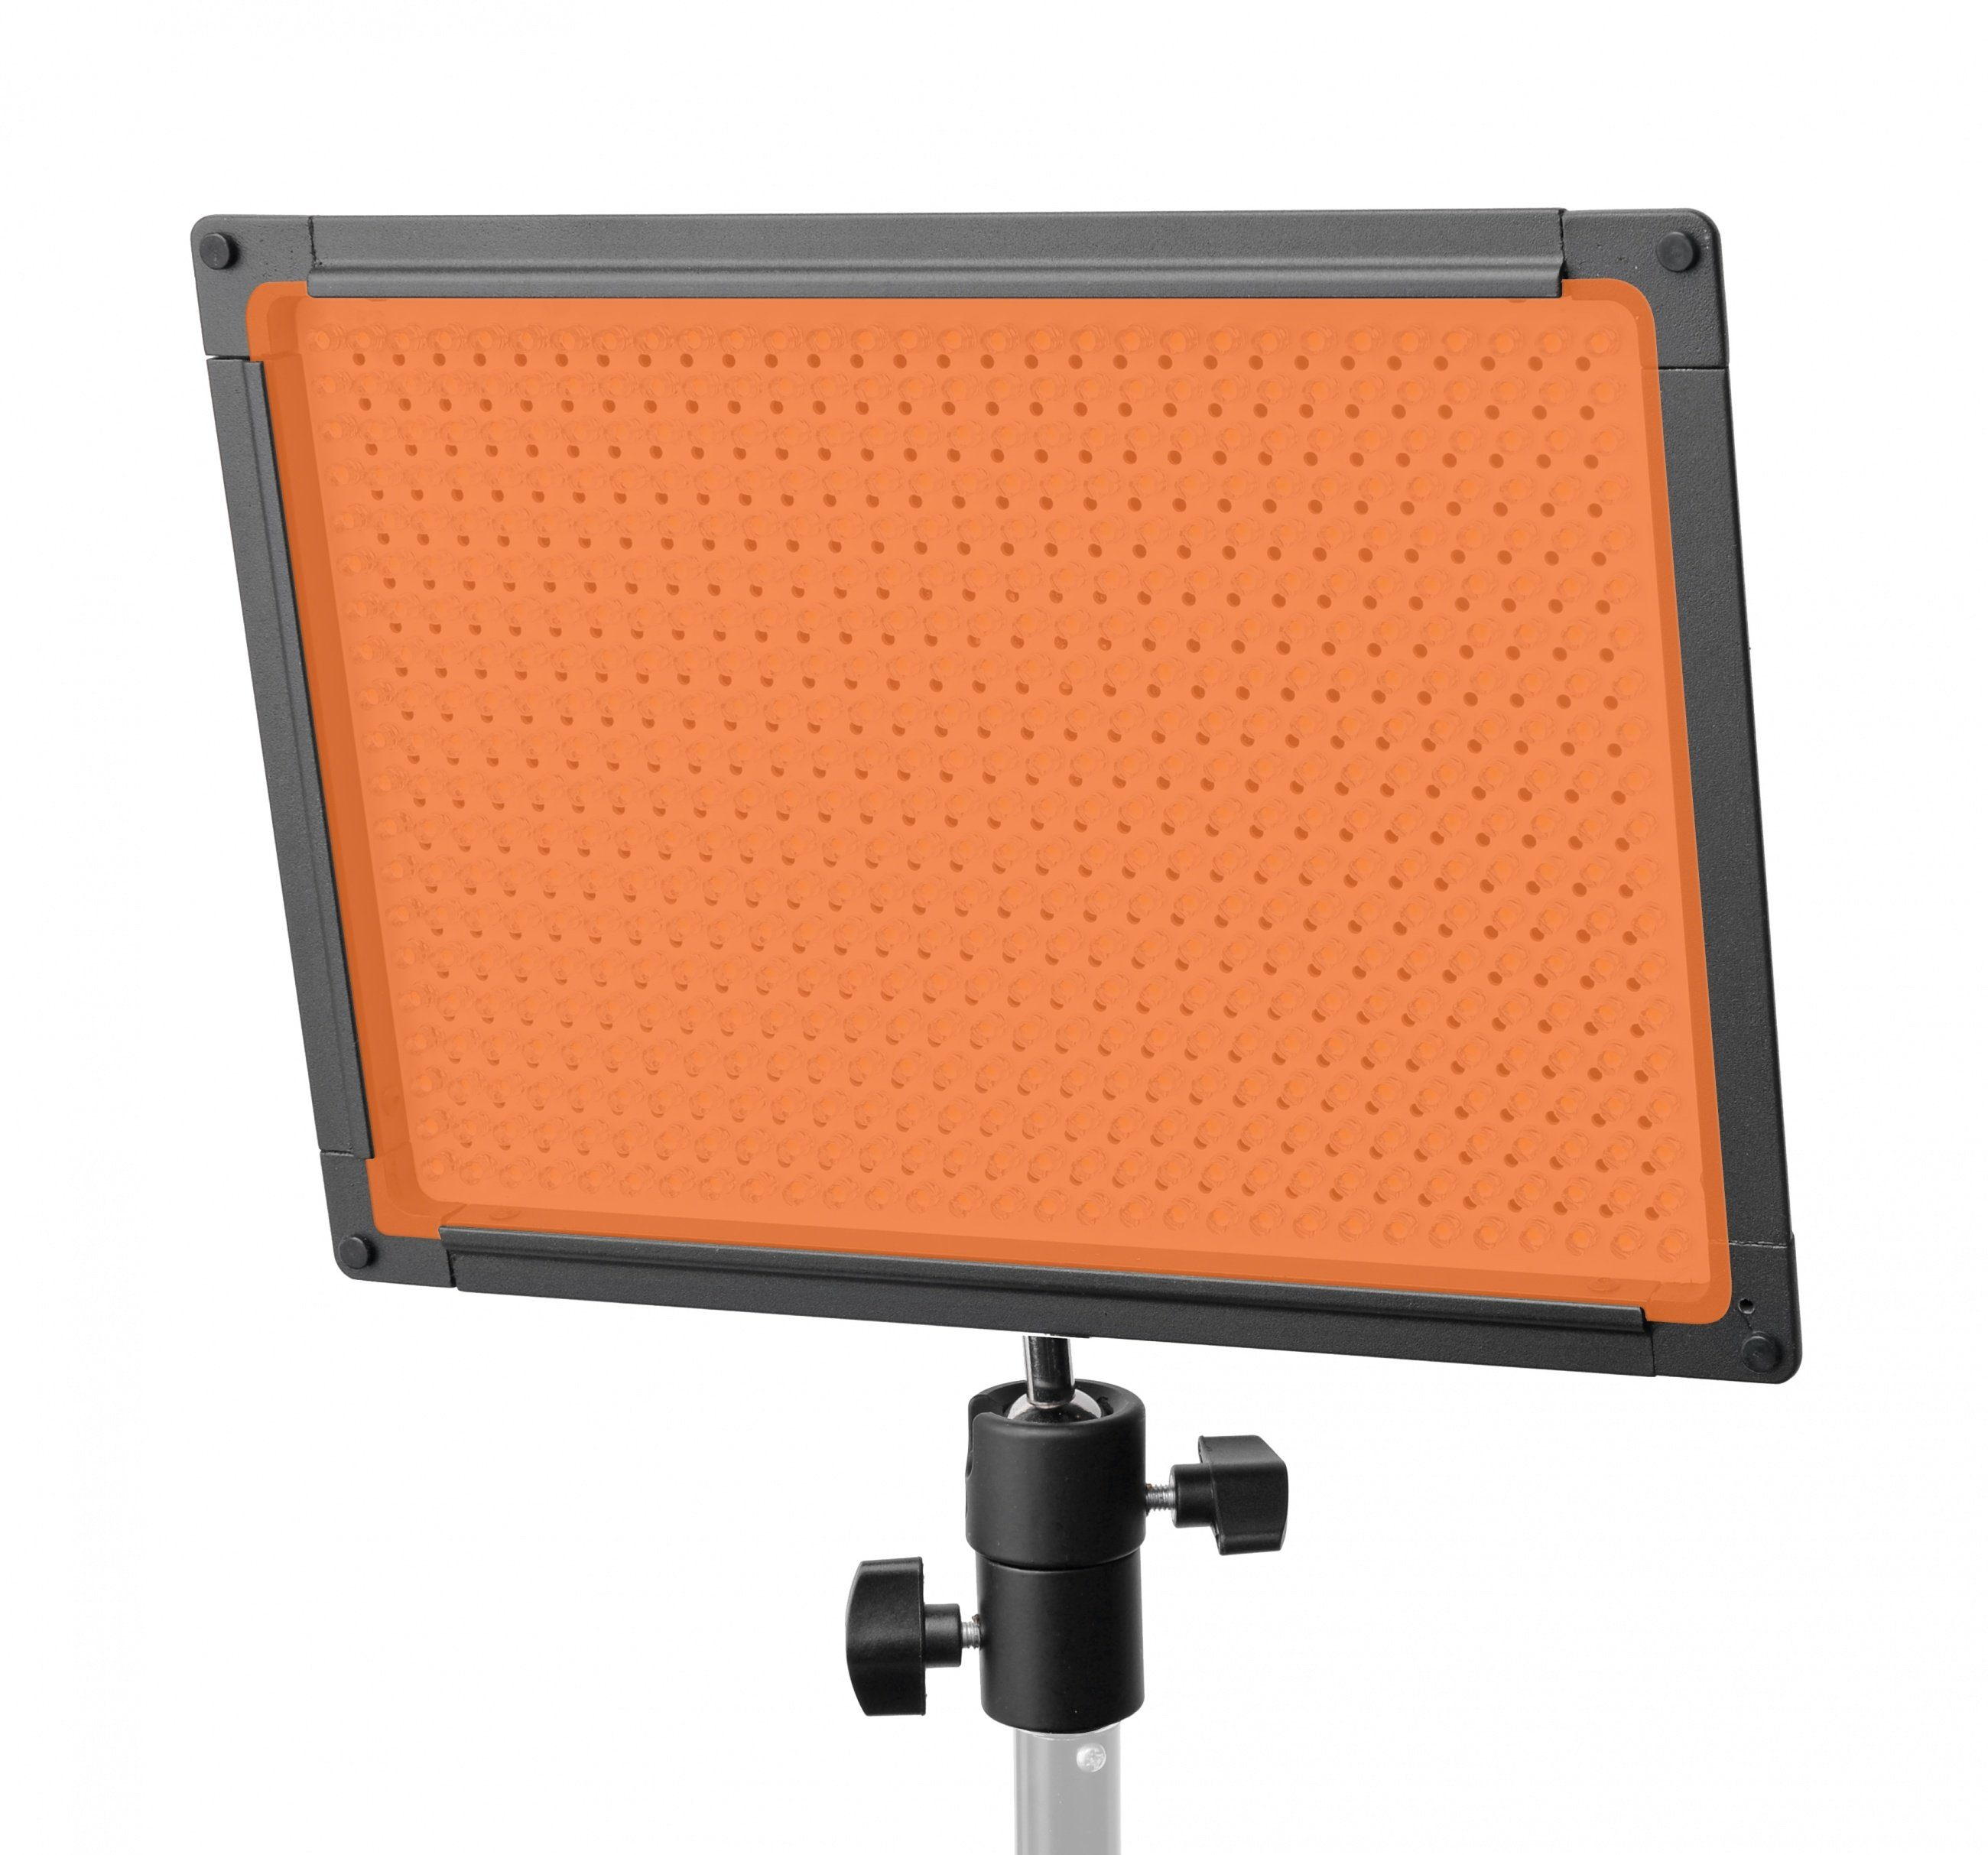 Bresser Fotostudio »SH-600 36W/5.600LUX Slimline LED Studiolampe«